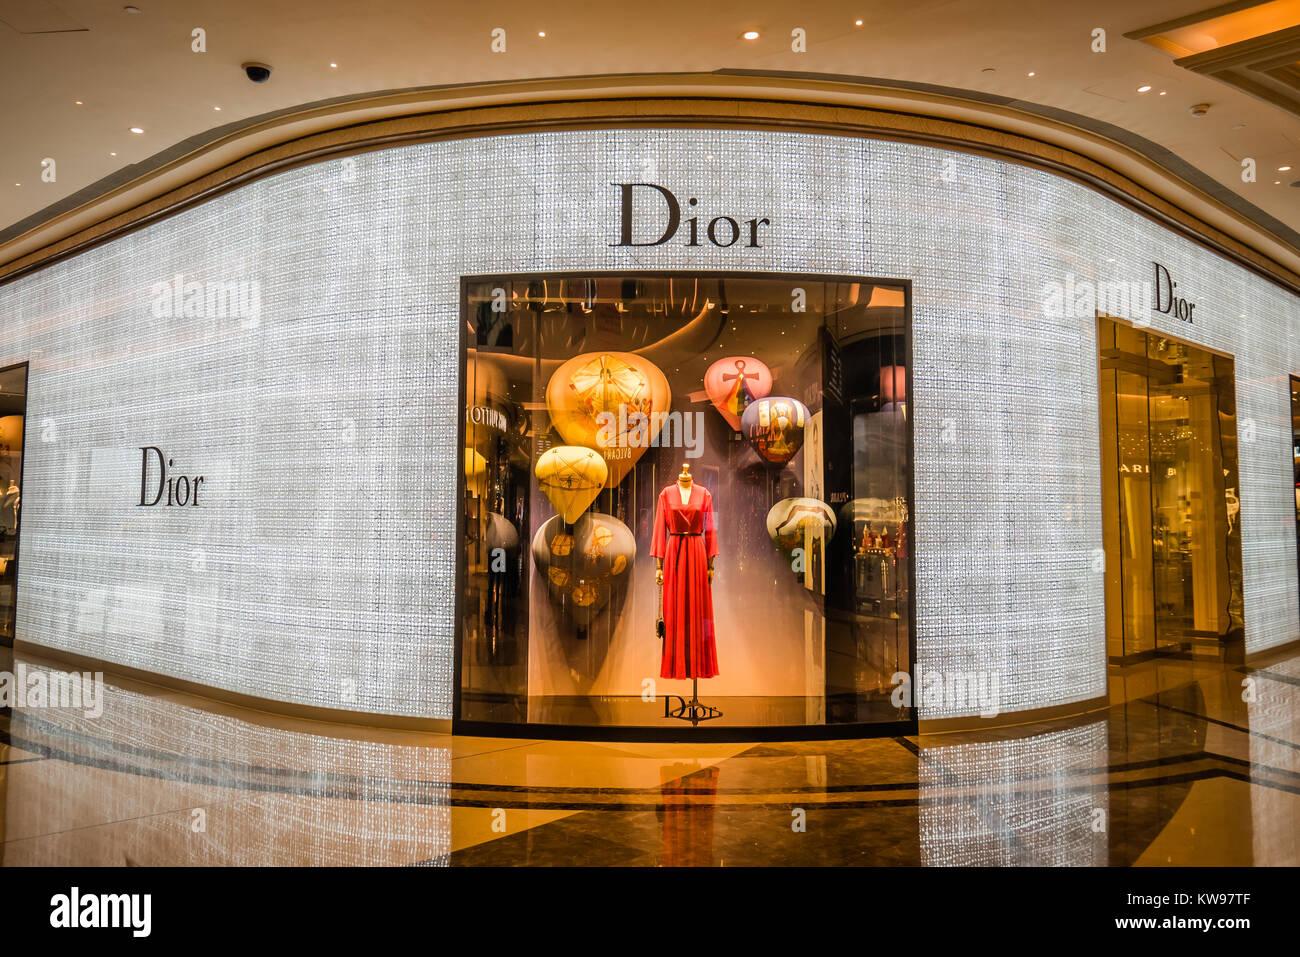 dior luxury store - Stock Image